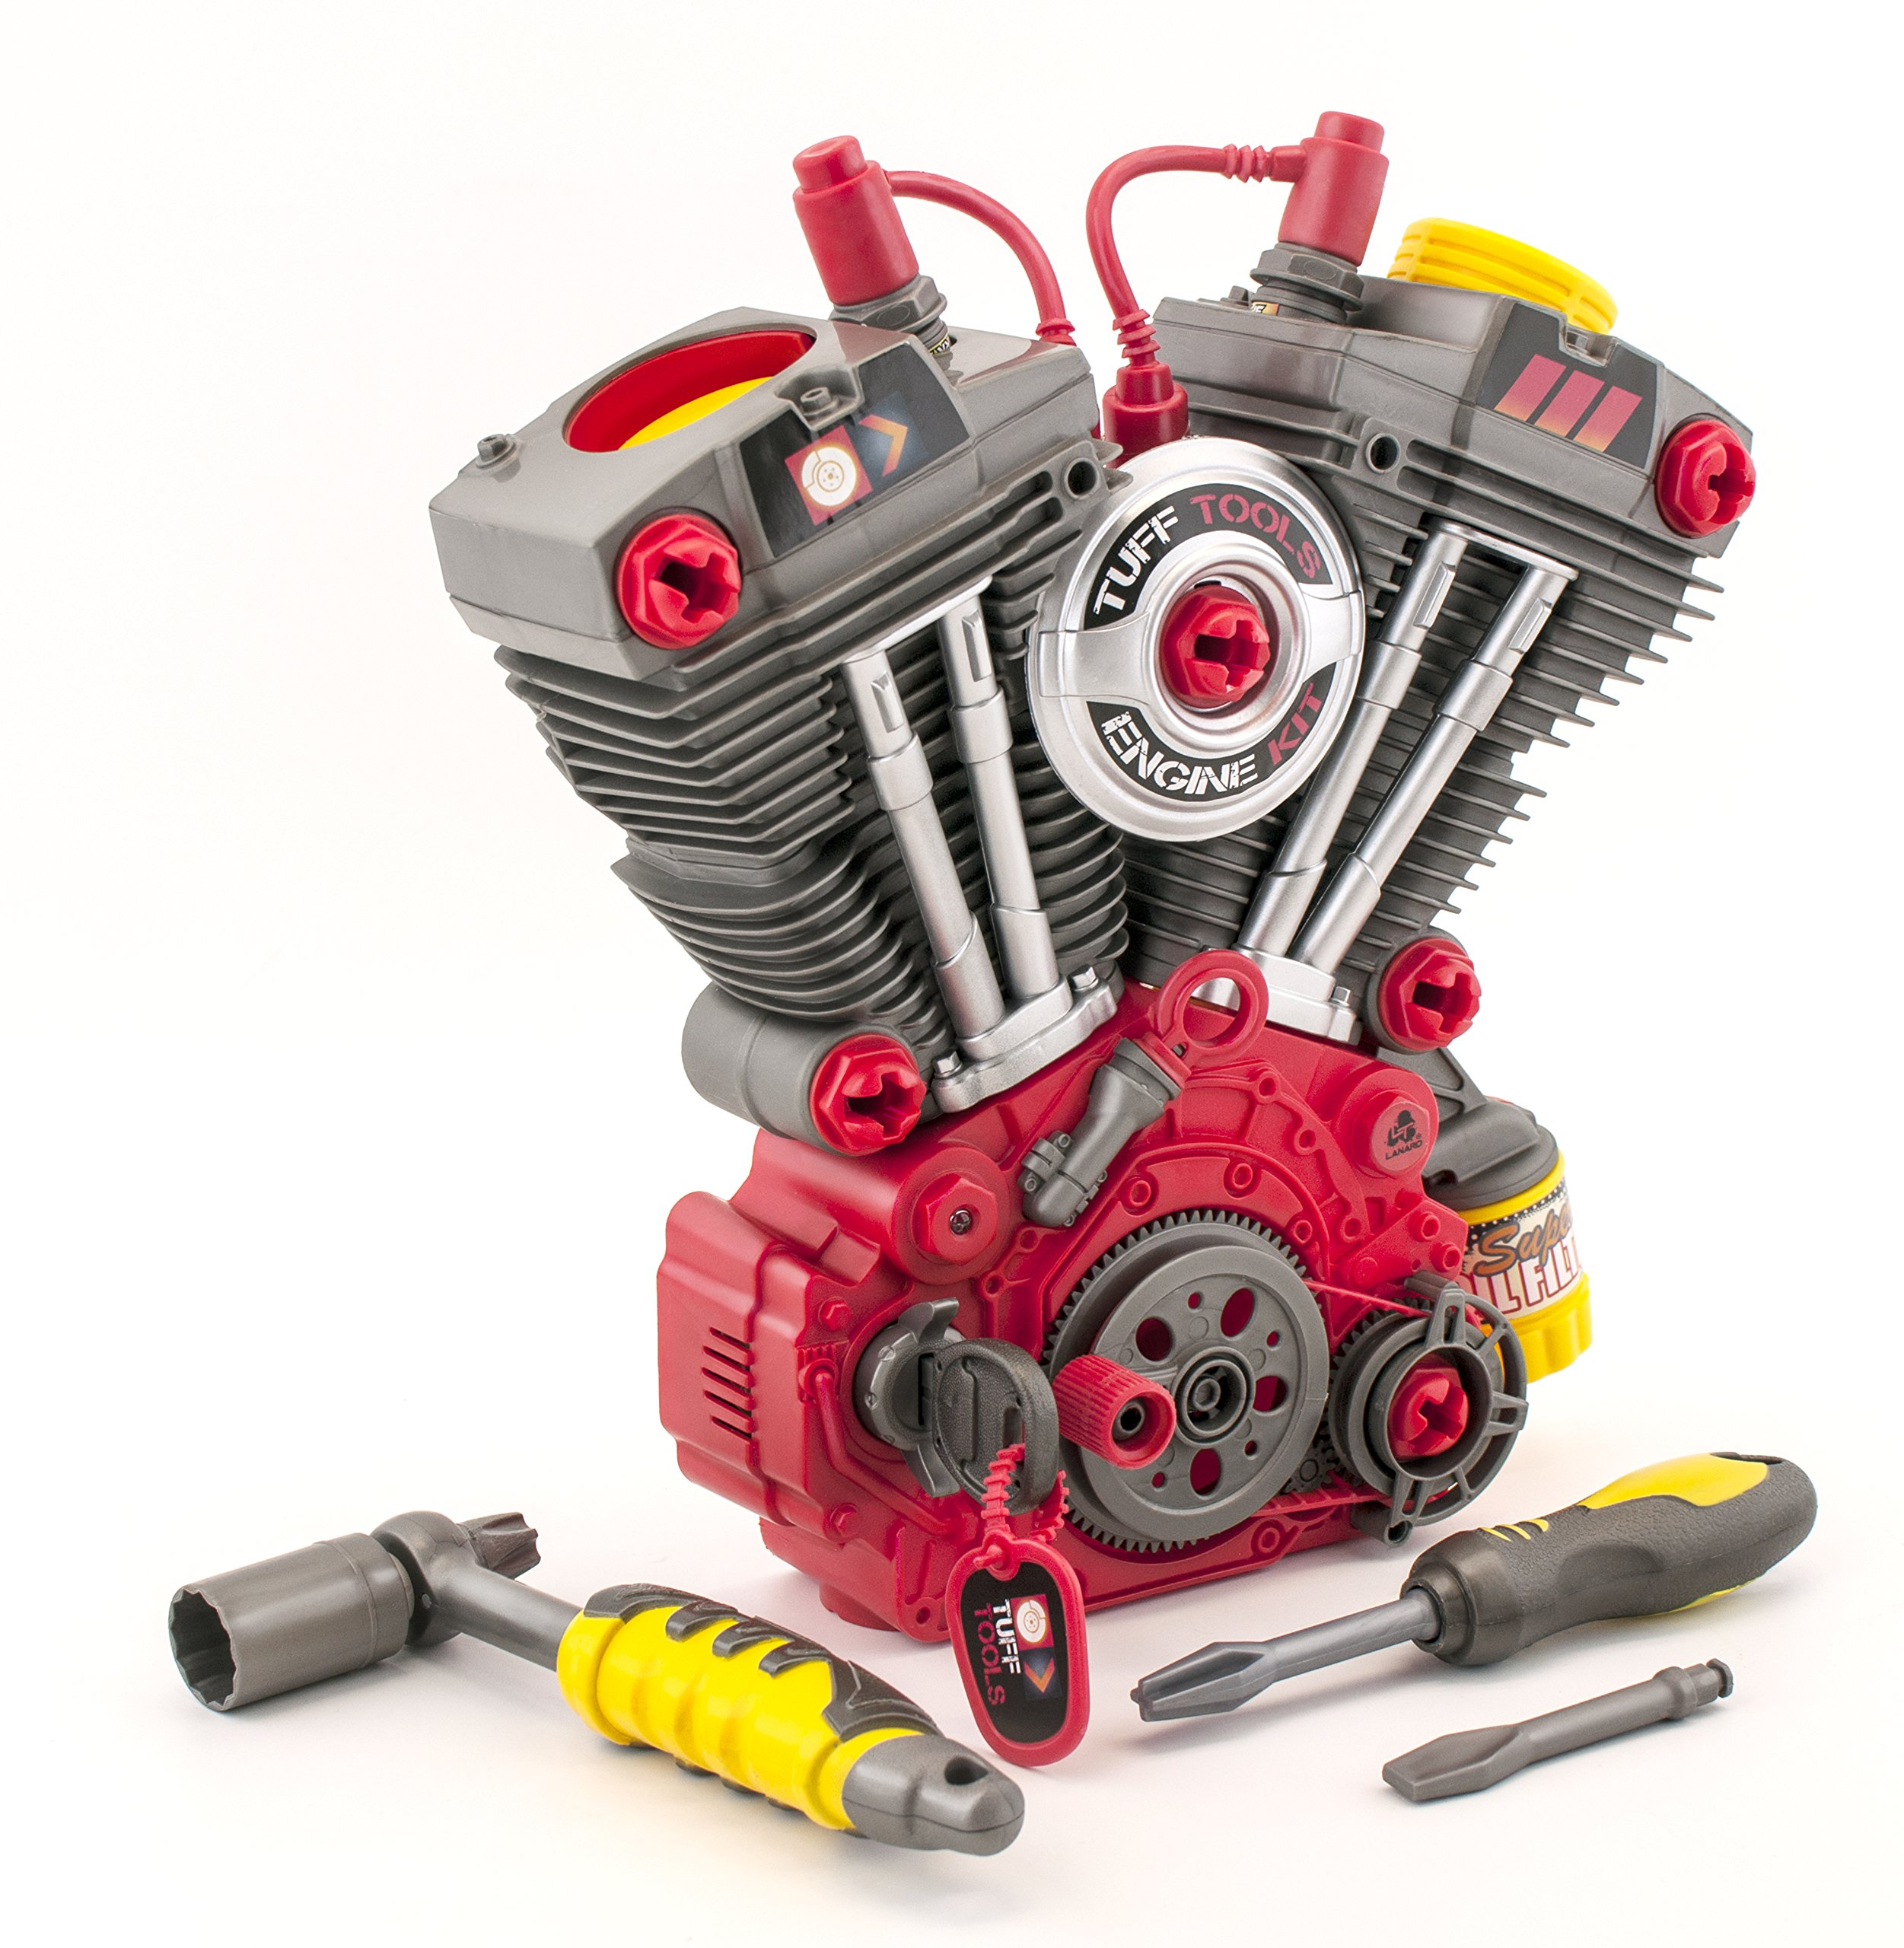 Lanard Light and Sound Engine Builder Set Toy